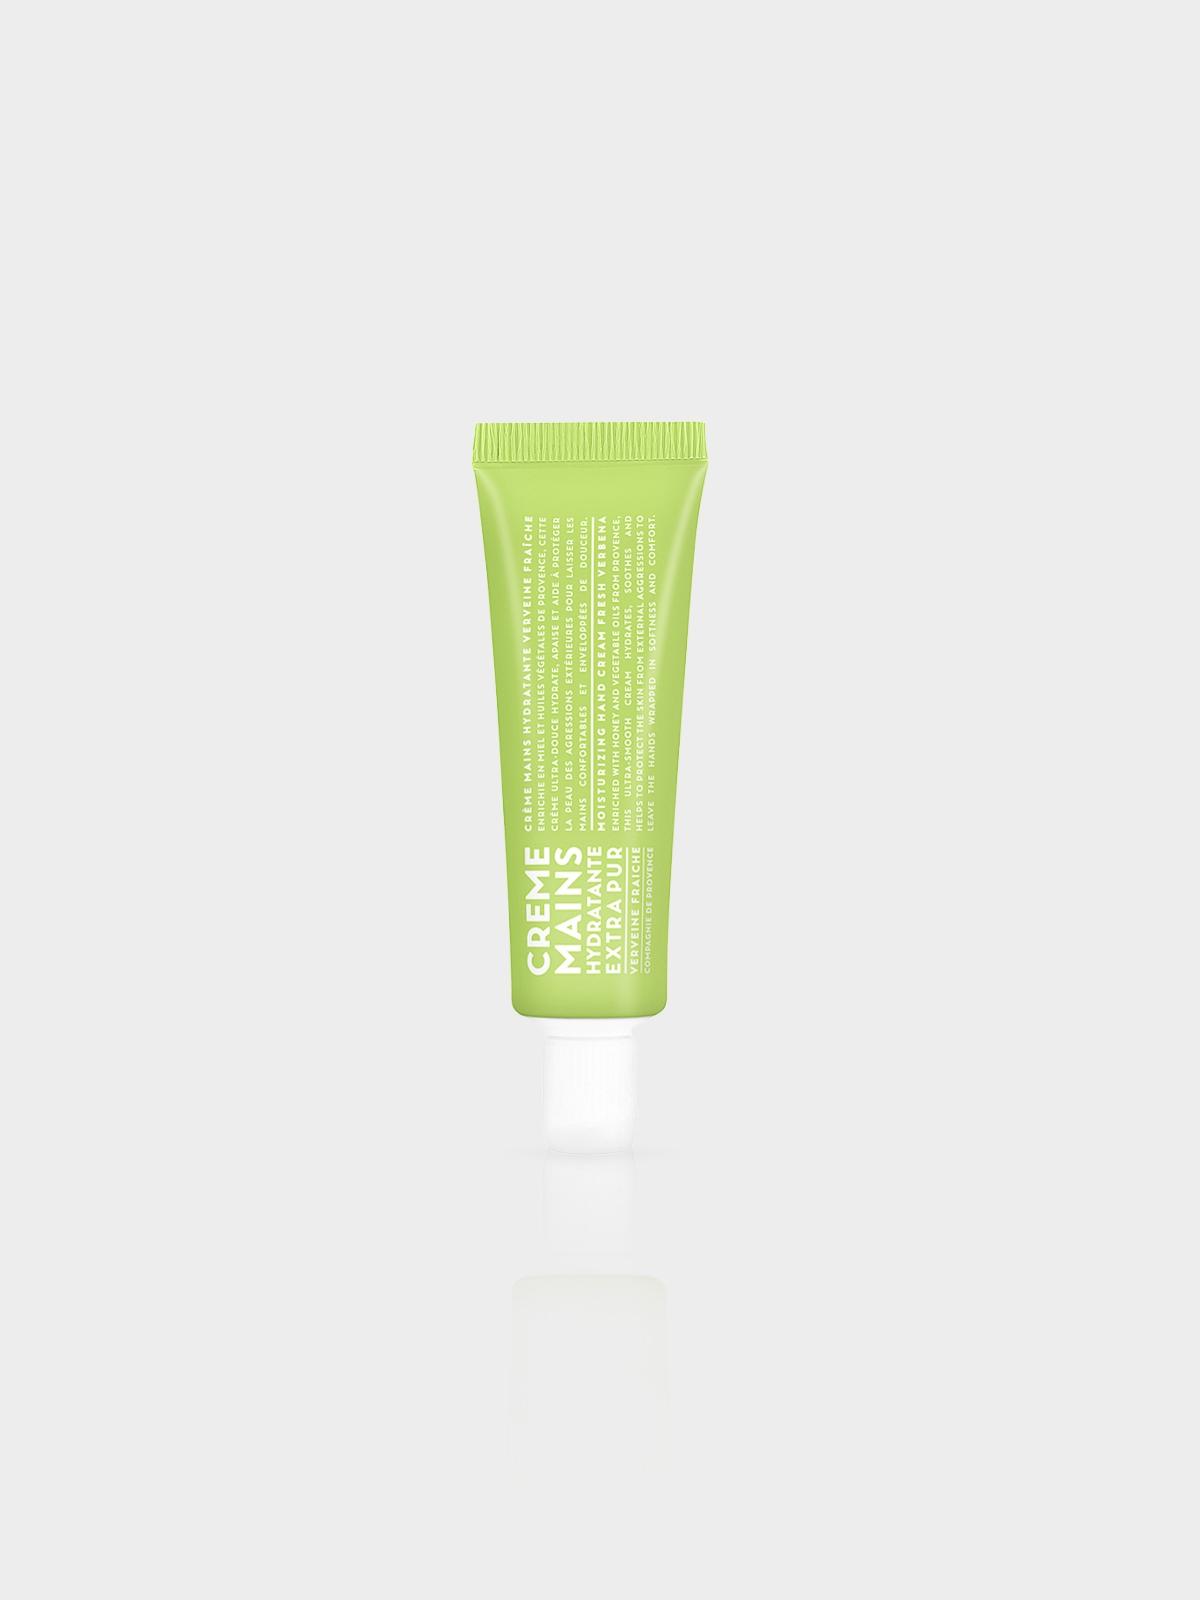 COMPAGNIE DE PROVENCE Hand Cream 30 ml FRESH VERBENA